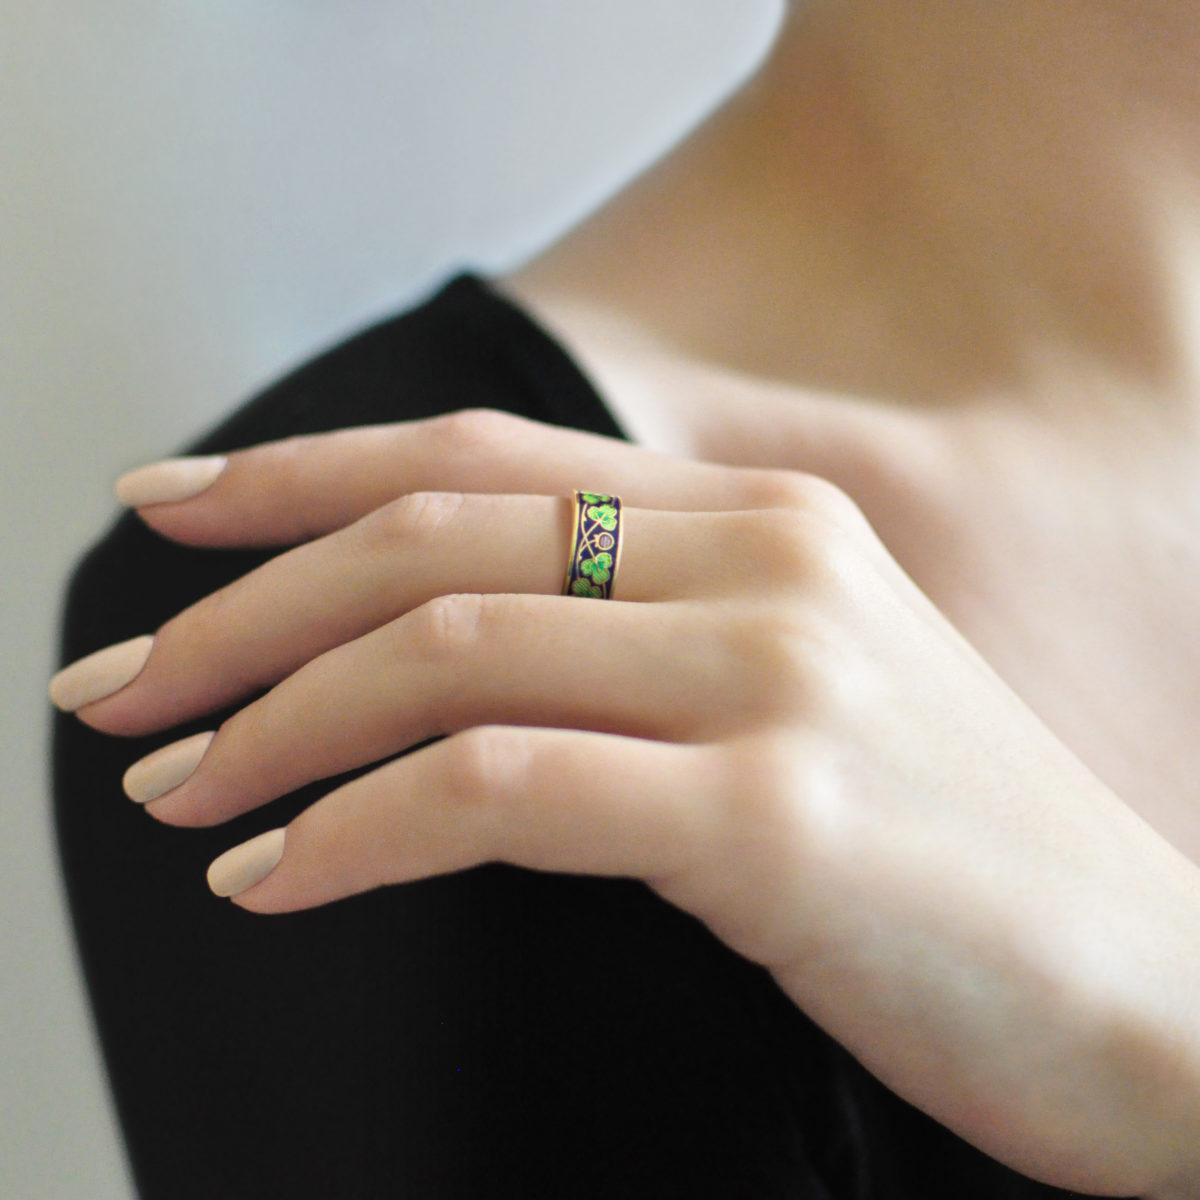 Zolochenie s zelenym 1200x1200 - Кольцо из серебра «Спас-на-крови» (золочение), зеленая